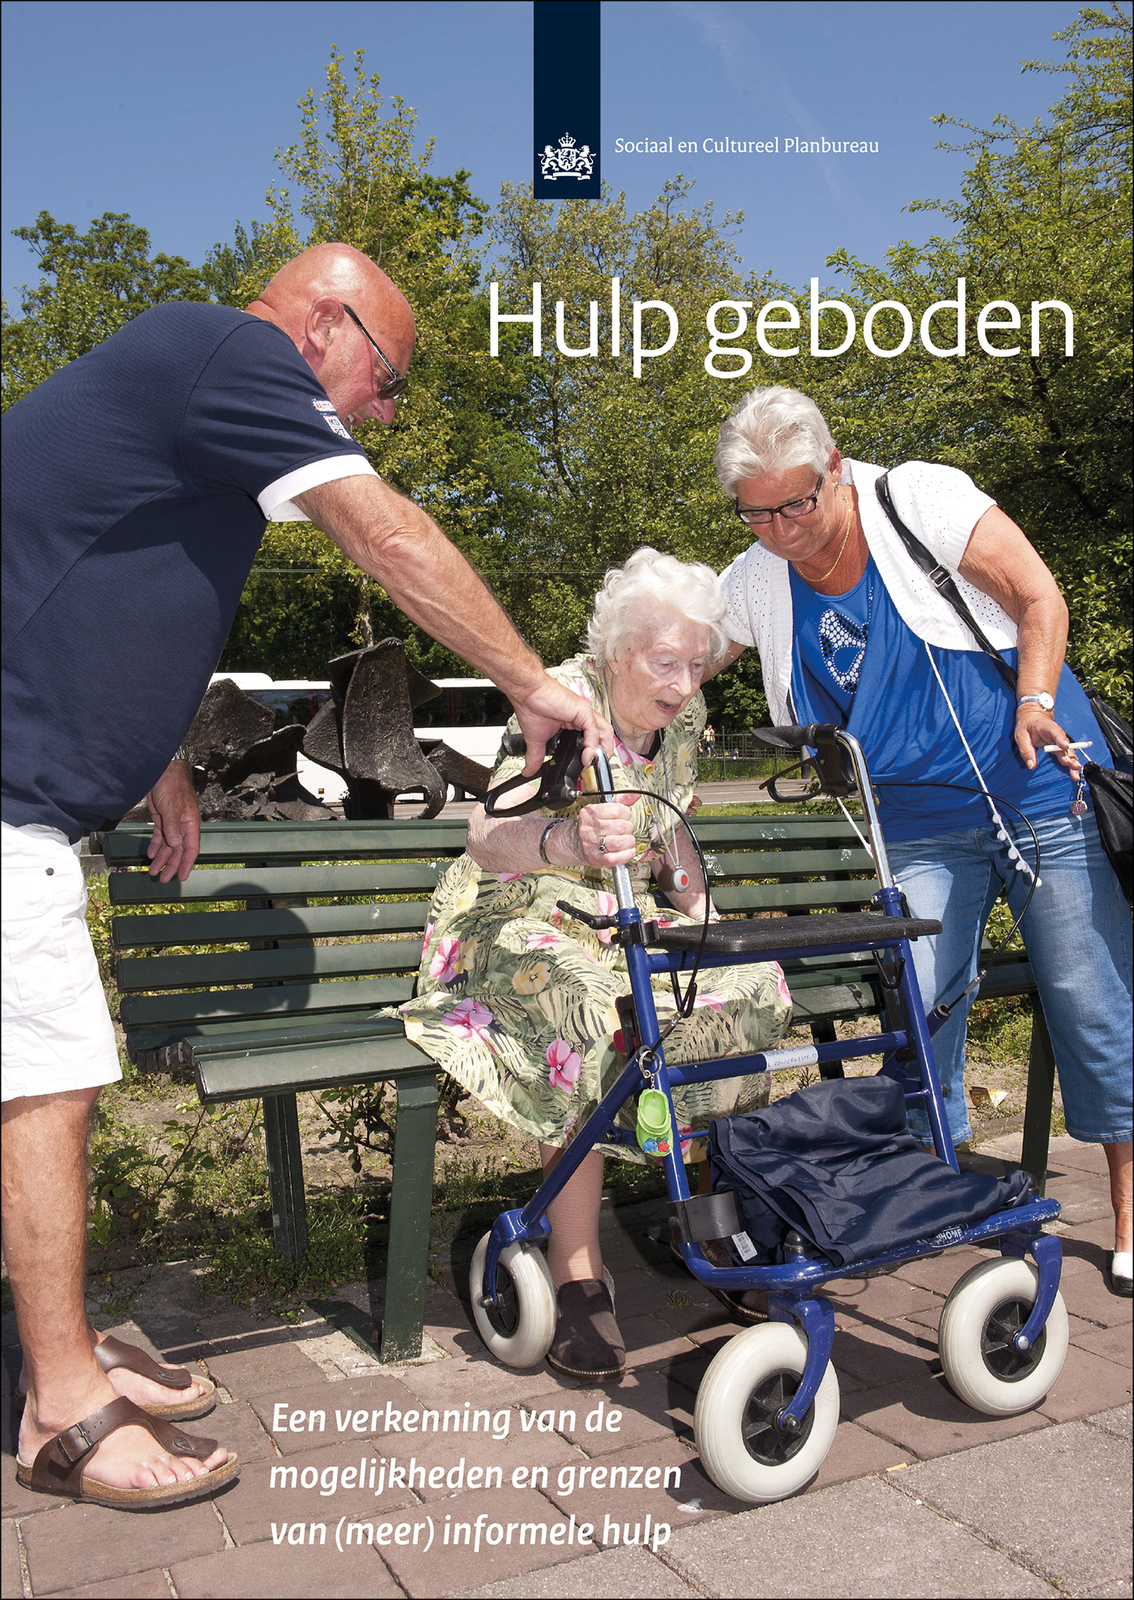 2014_27_Hulpgeboden.indd